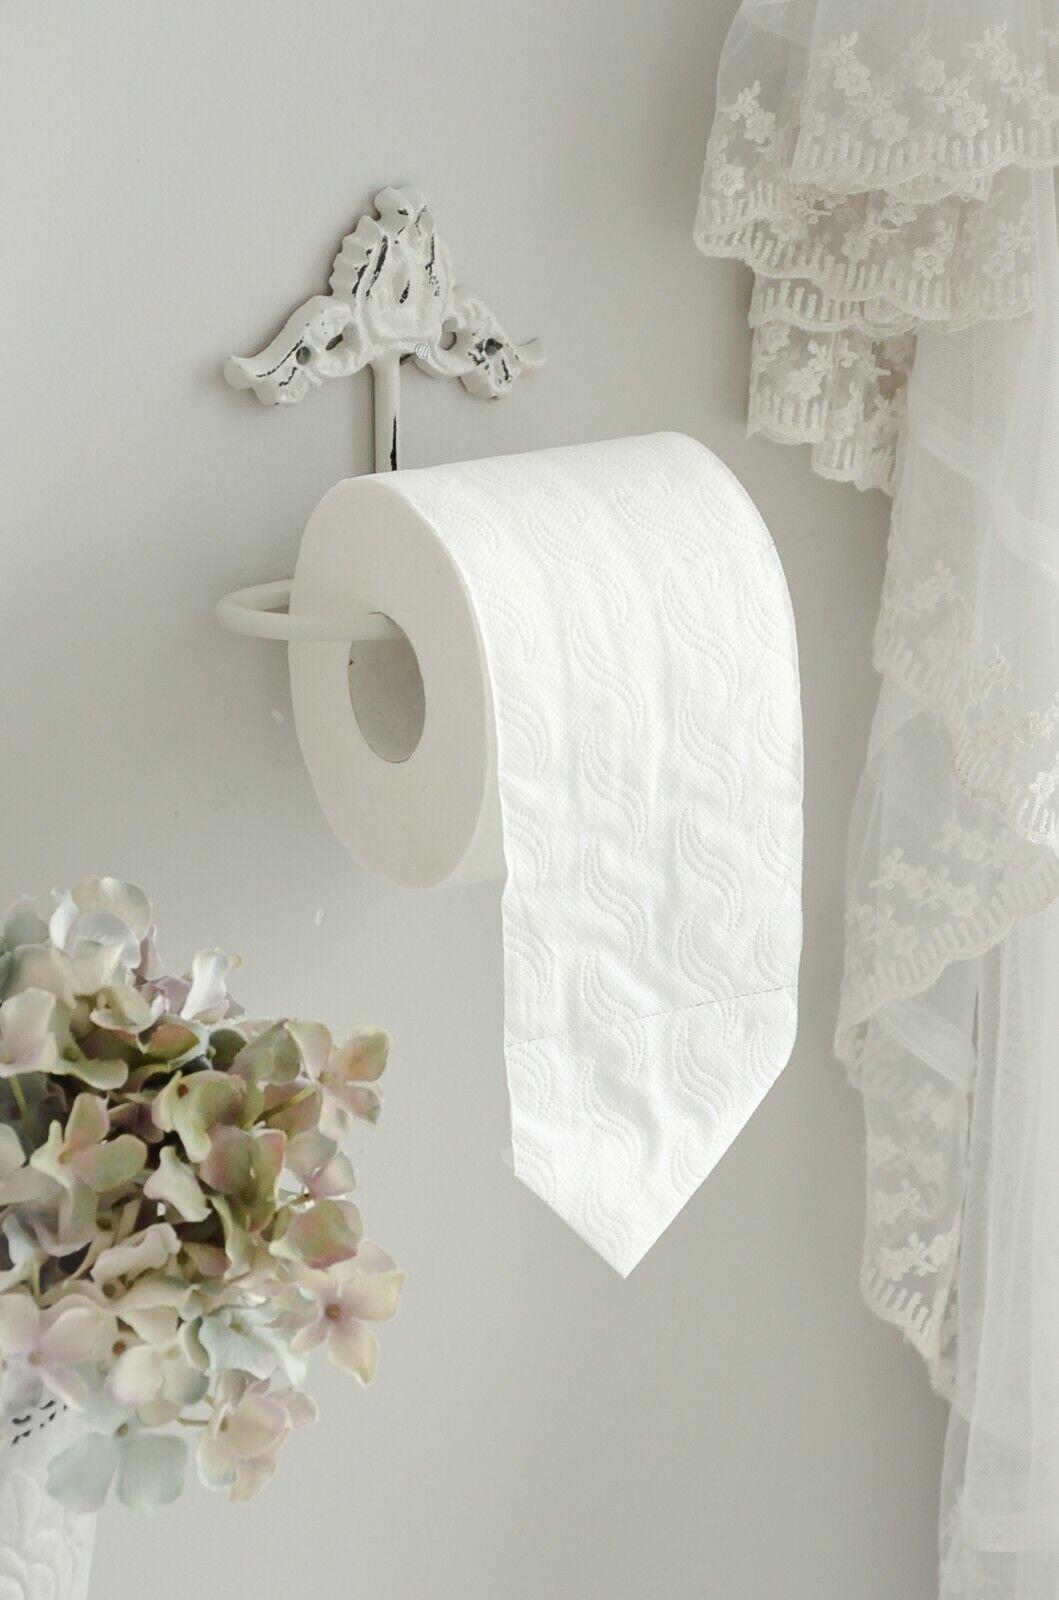 WC Rollenhalter Toilettenpapierhalter Toilettenrollenhalter Wand Shabby Chic